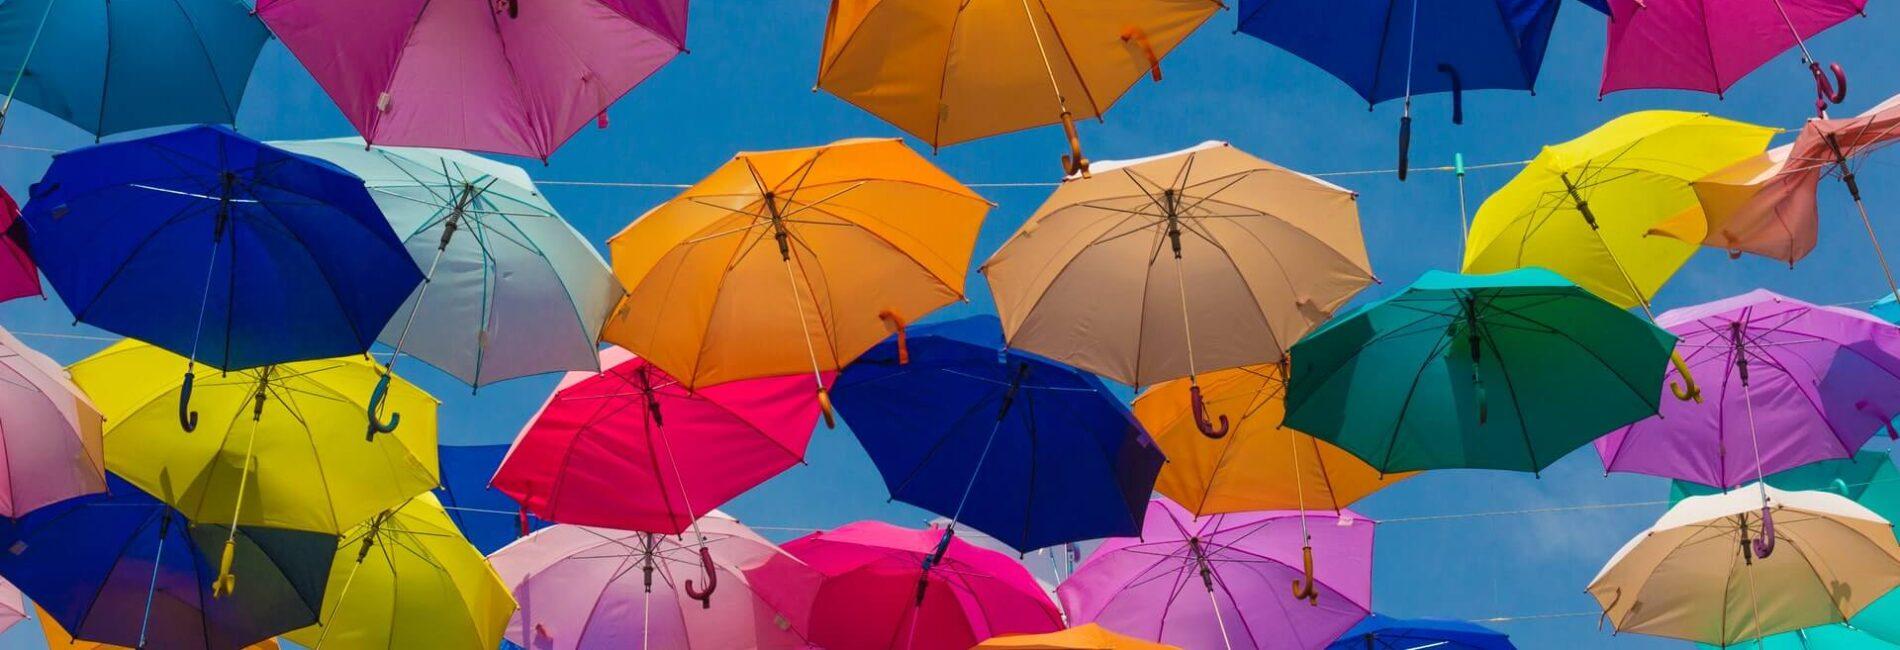 Umbrella Insurance Policy—Why Do I Need This Insurance?